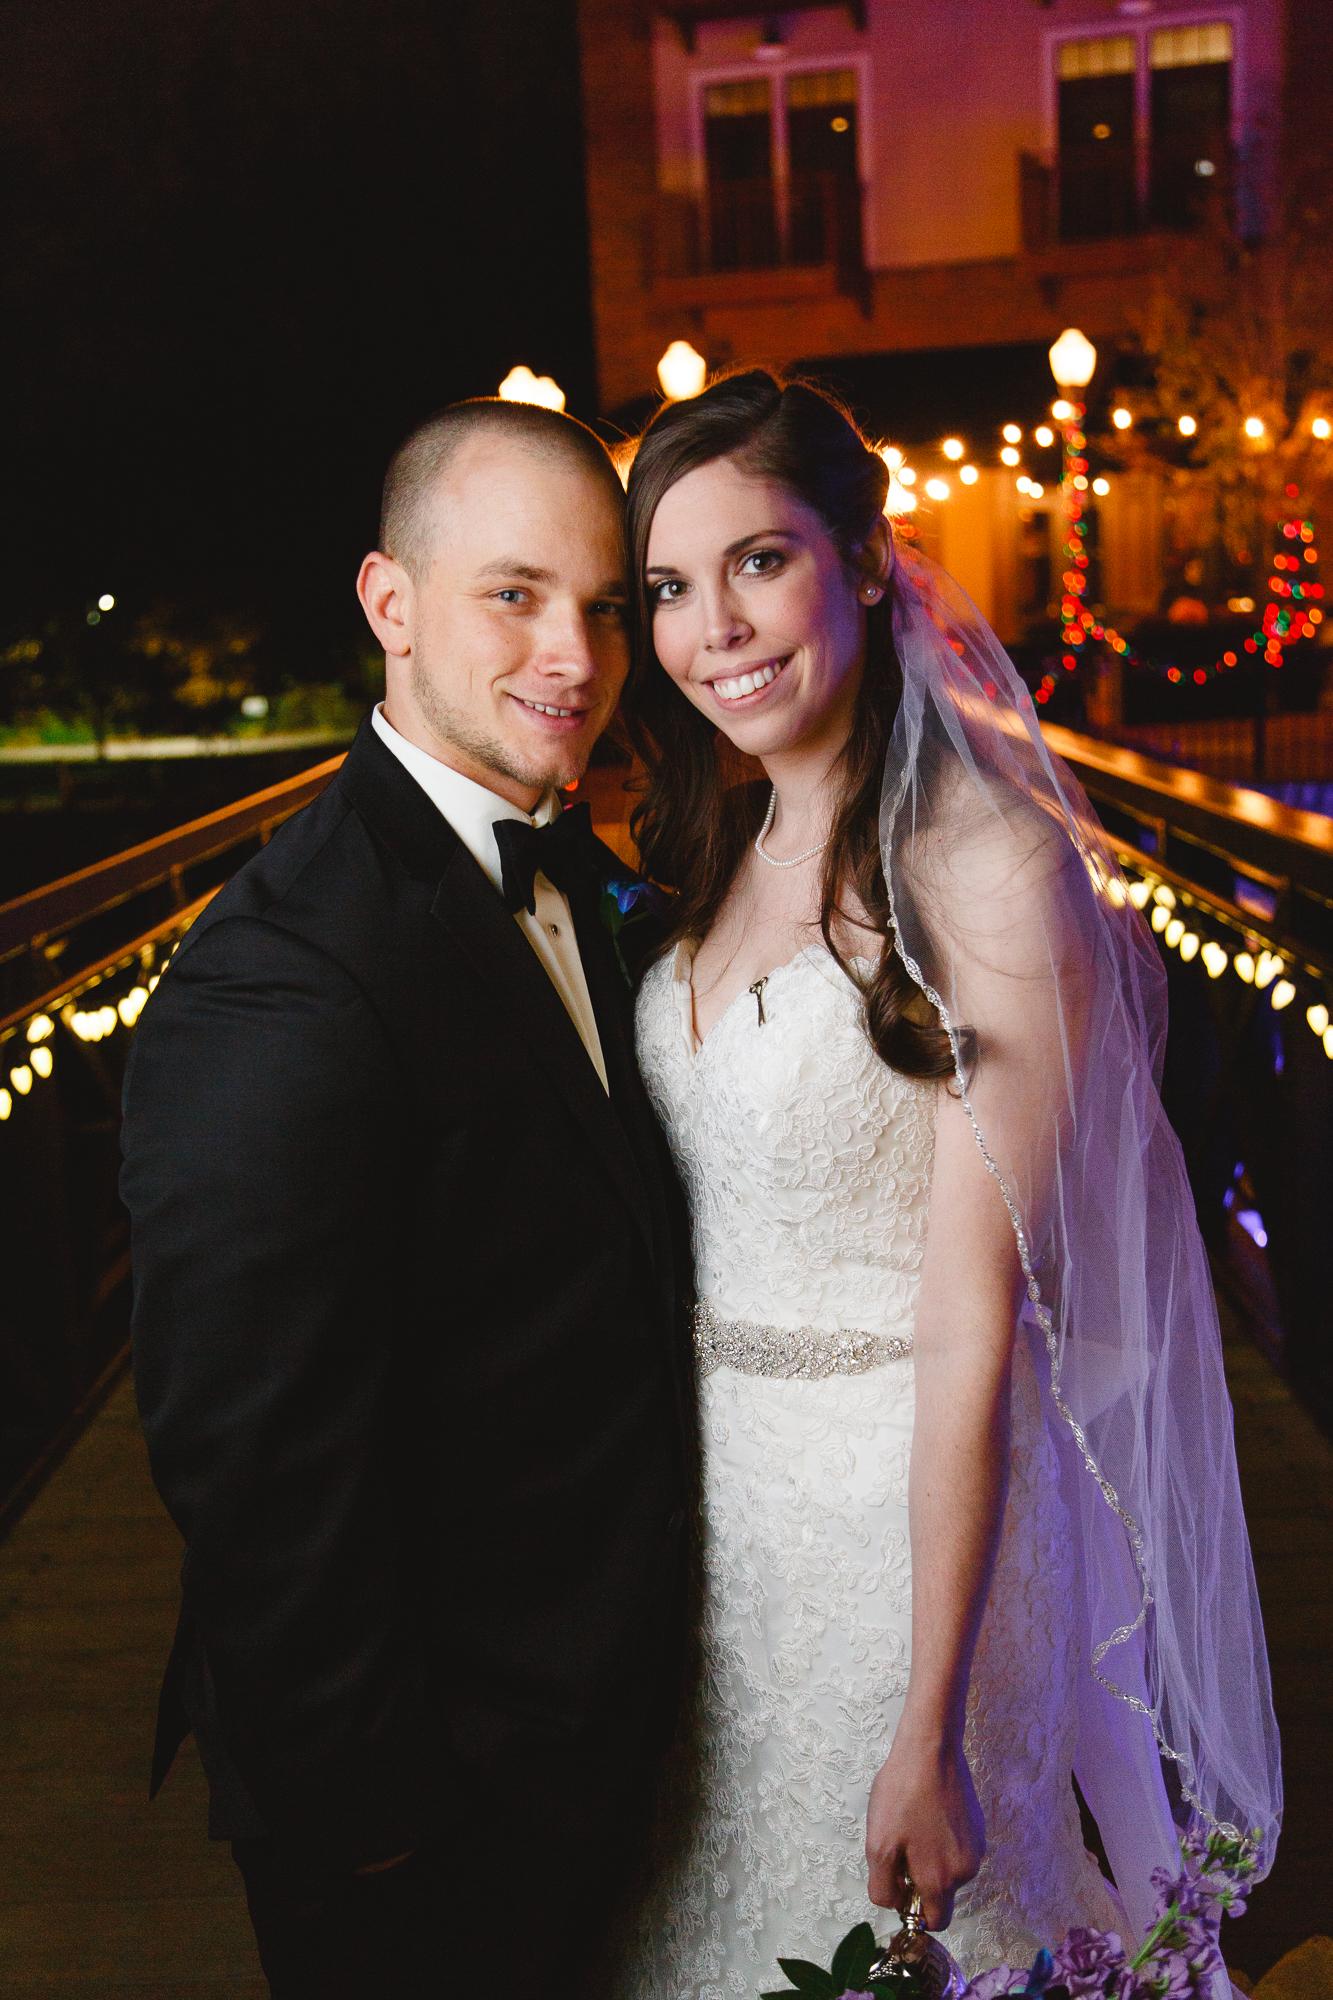 a-ohio-lighting-ocf-columbus-wedding-couple-bridal-creekside-conference-indoor-roxanna-sue-photos-ohio-photography-1.jpg